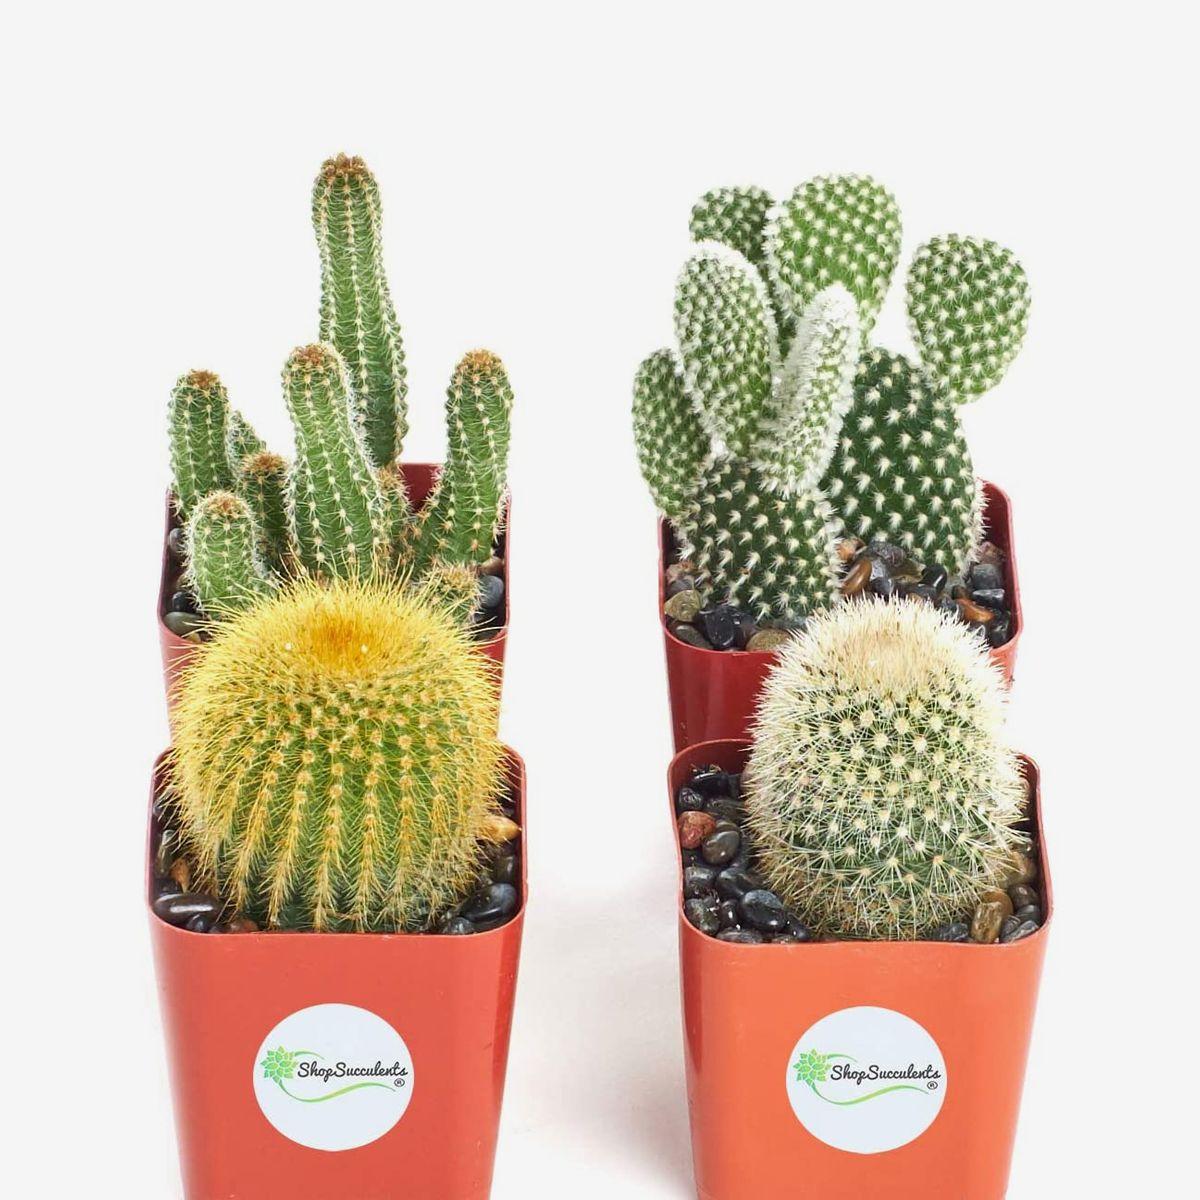 Squared terra cotta planters hold various cacti.